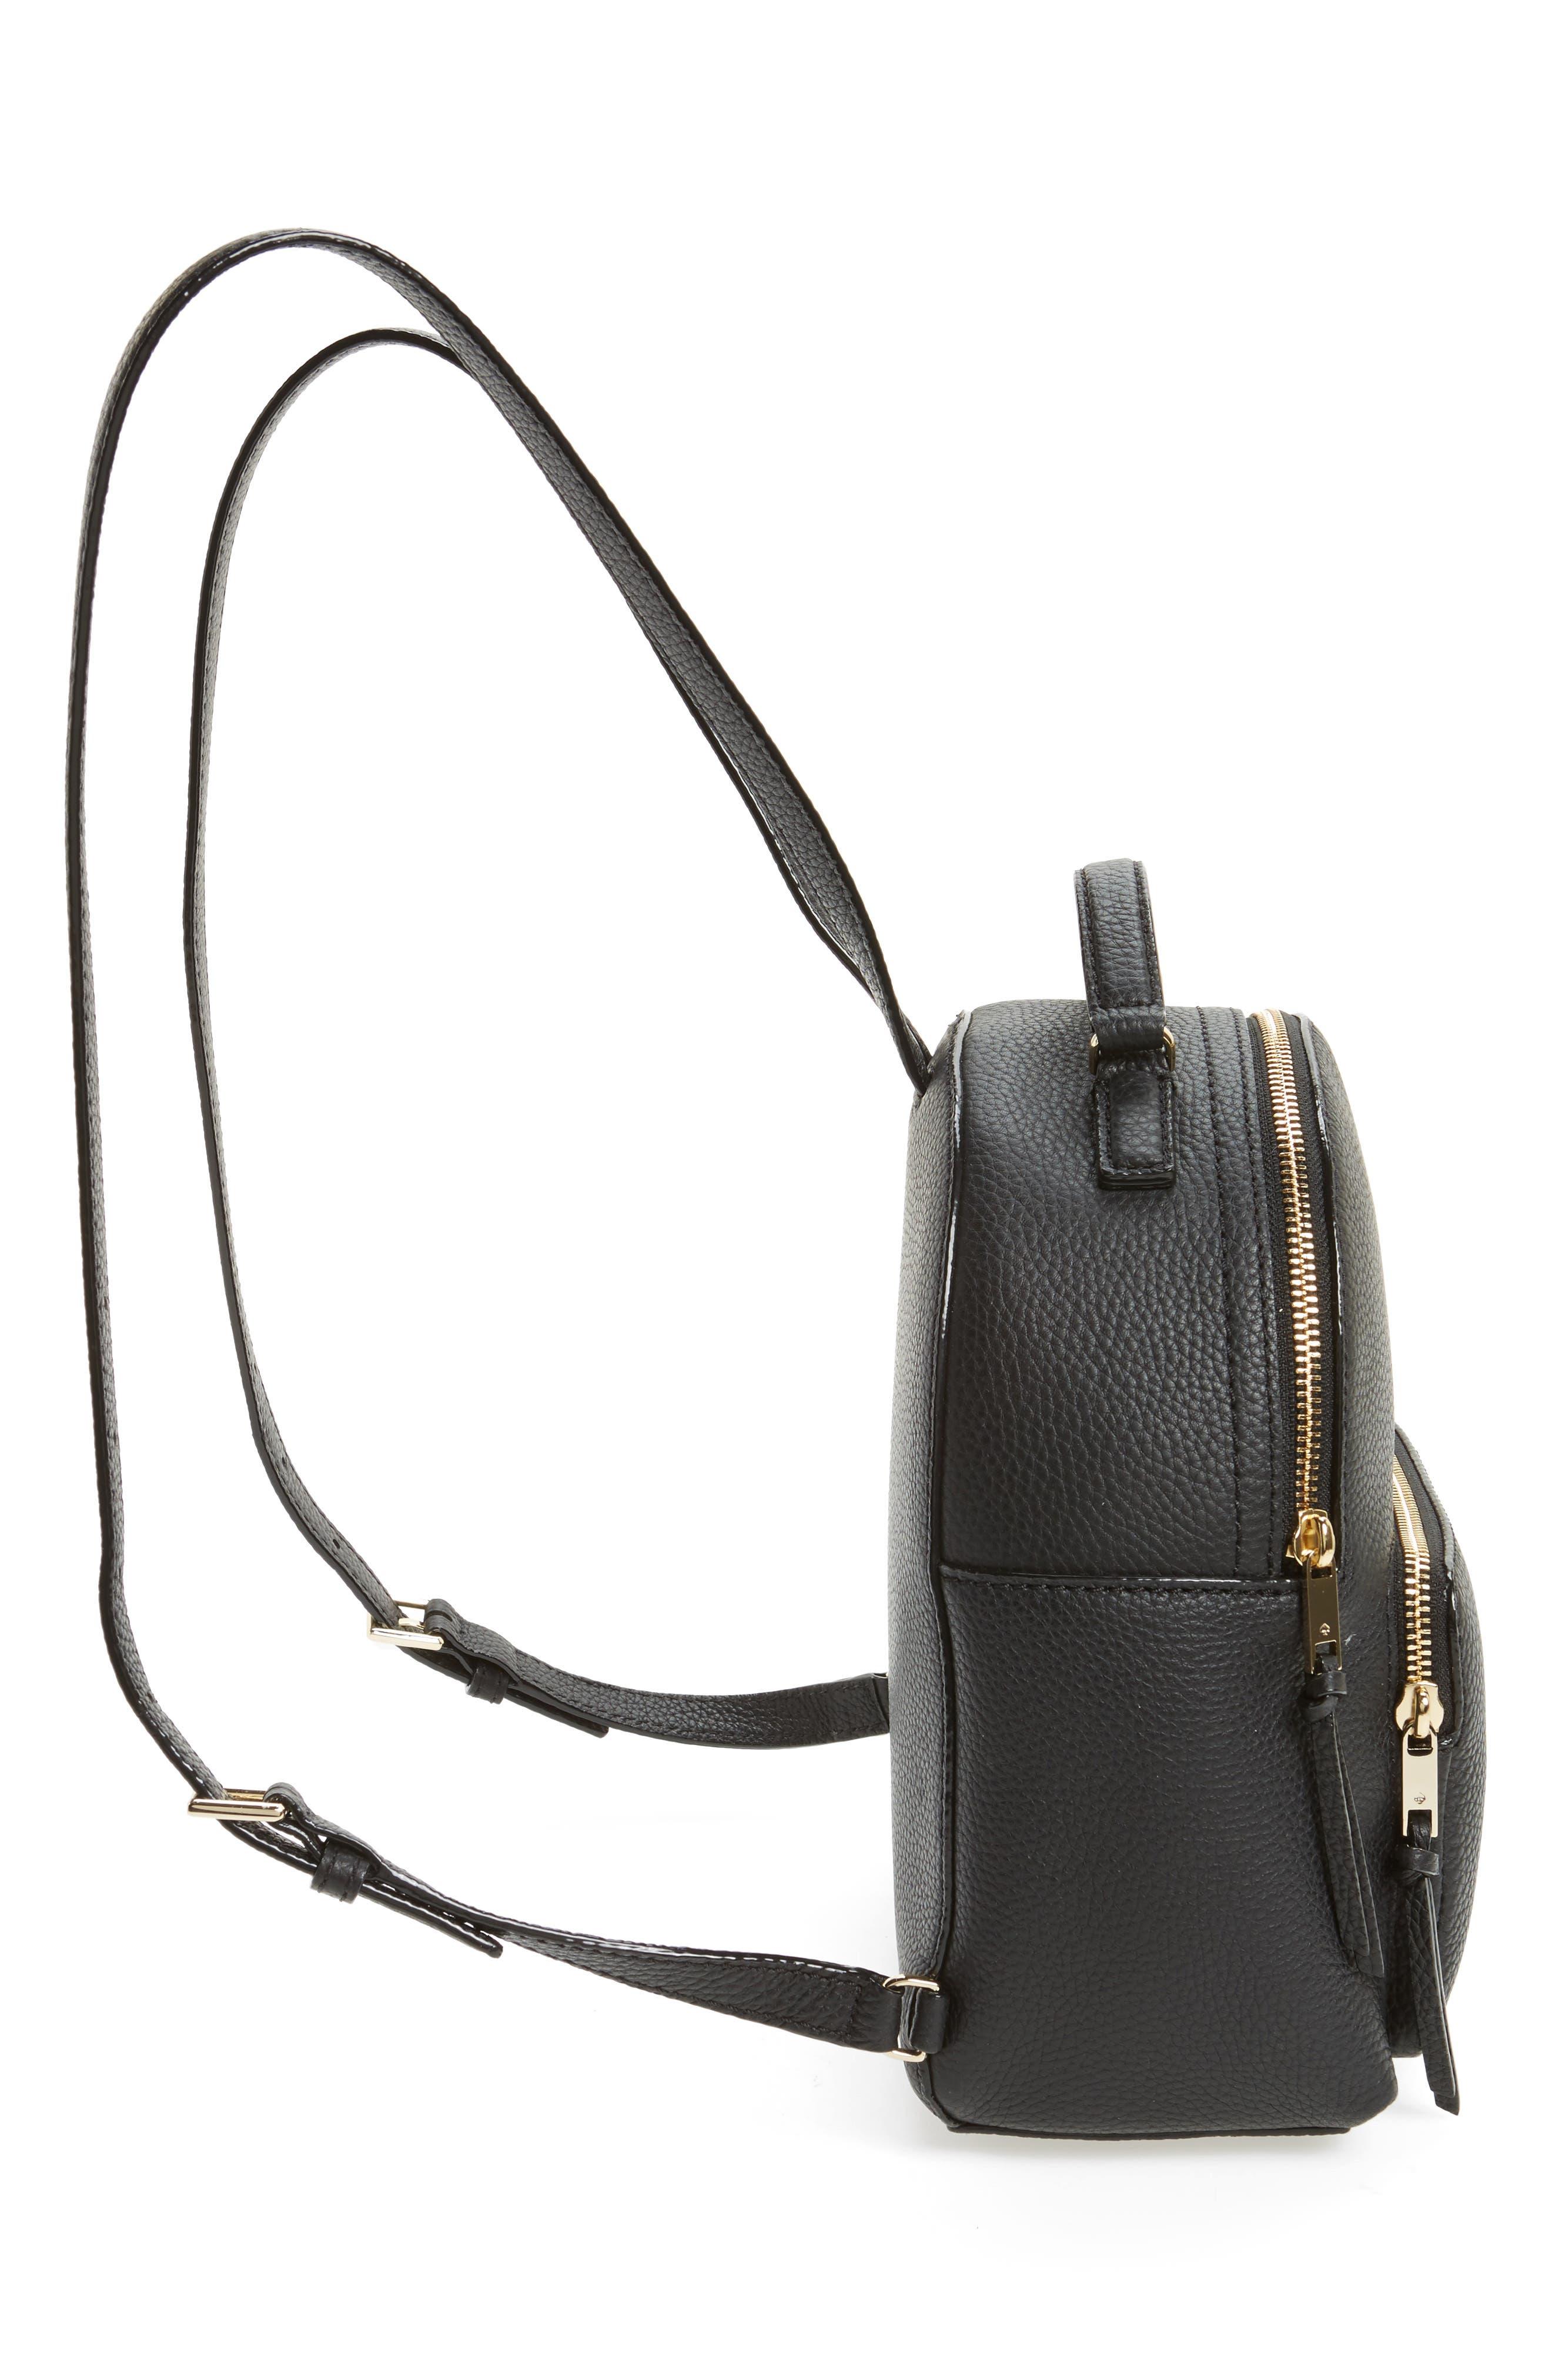 KATE SPADE NEW YORK, jackson street - keleigh leather backpack, Alternate thumbnail 5, color, 001